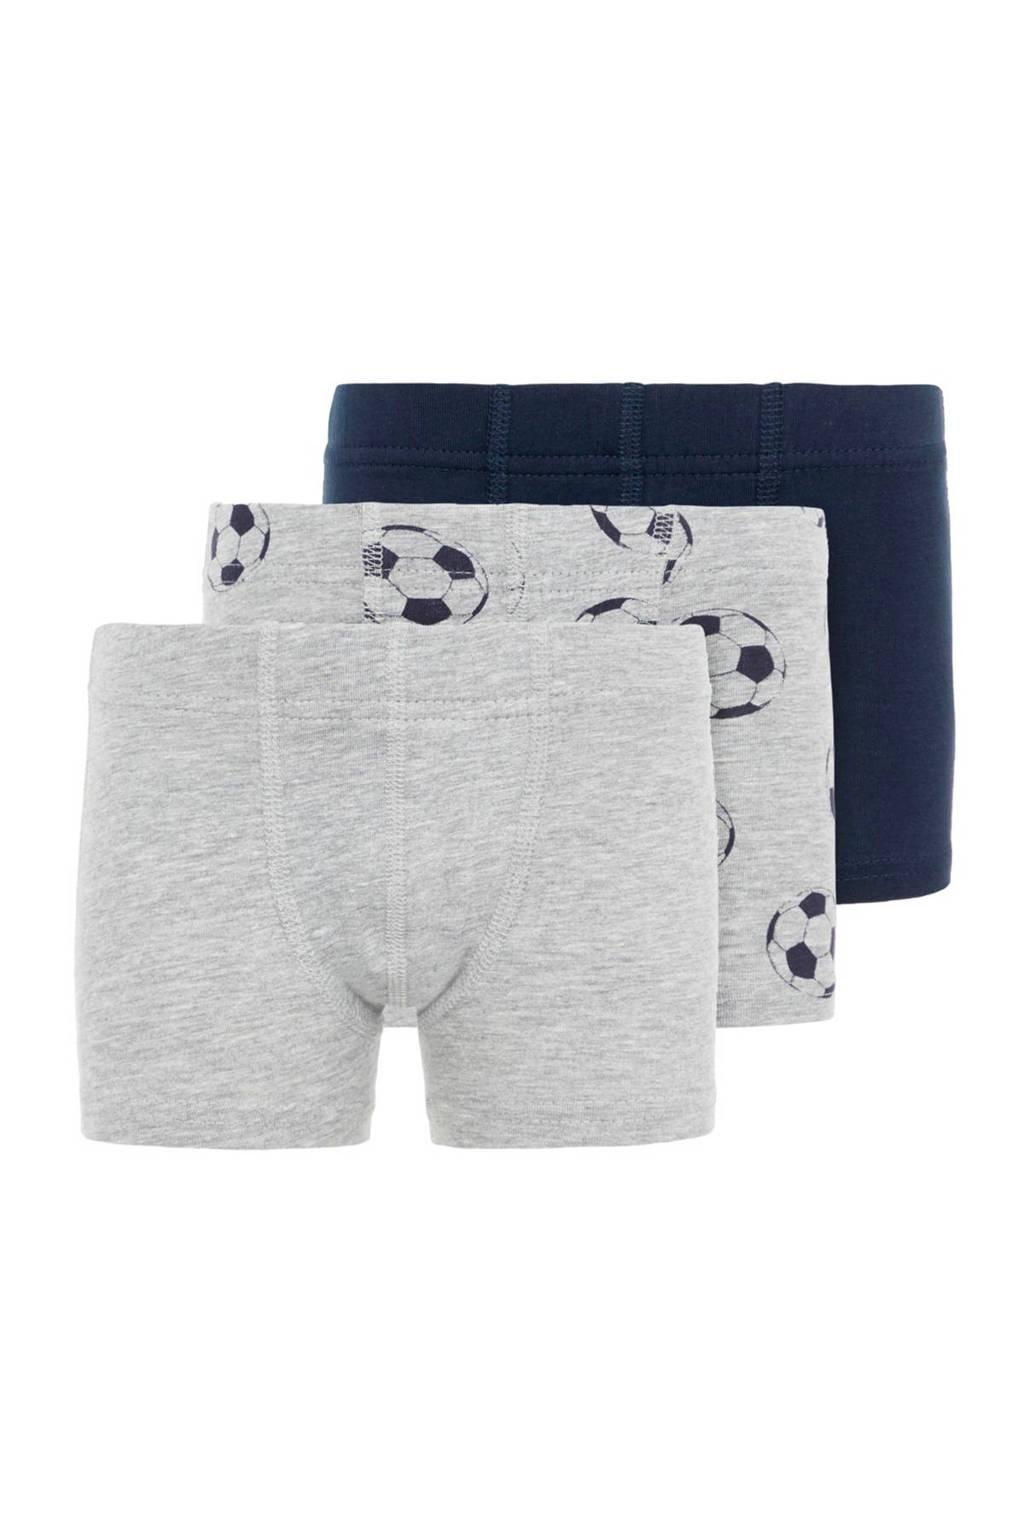 NAME IT MINI   boxershort - set van 3 donkerblauw/grijs melange, Grijs melange/ donkerblauw